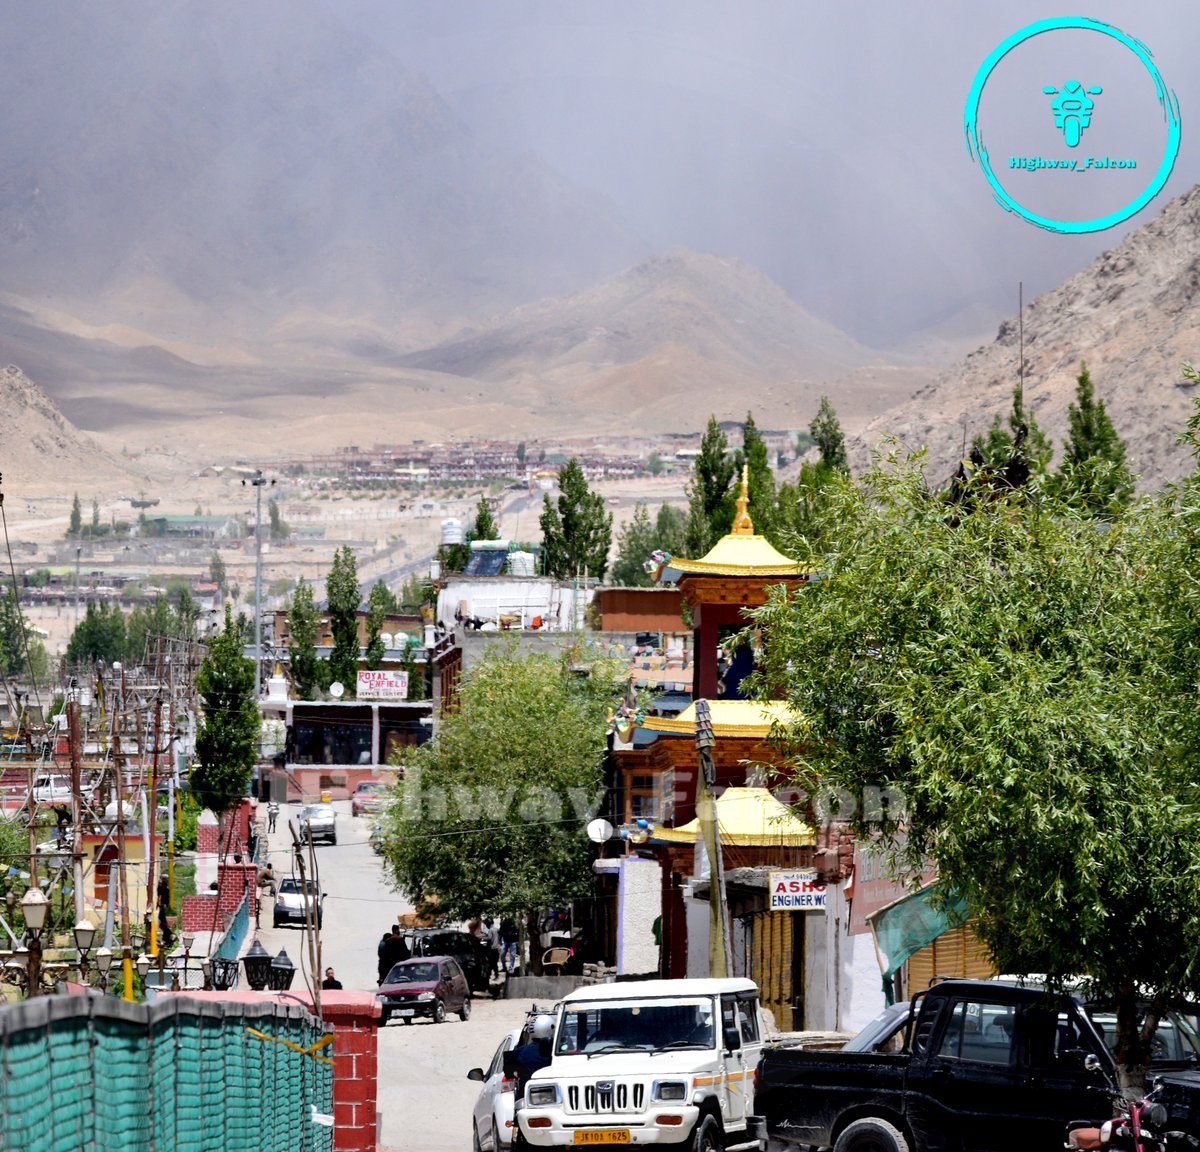 Leh. #Ladakh #travel #Himalayas #mountains #IncredibleIndia #travelphotography #nature #photography #Wanderlust #adventure #HimachalPradesh #royalenfield #roadtrip #travelvlogger #landscape #NaturePhotography #WednesdayMotivation #highwayfalcon STAY HOME  STAY SAFE #COVID19 https://t.co/L9Z8xxwMyx